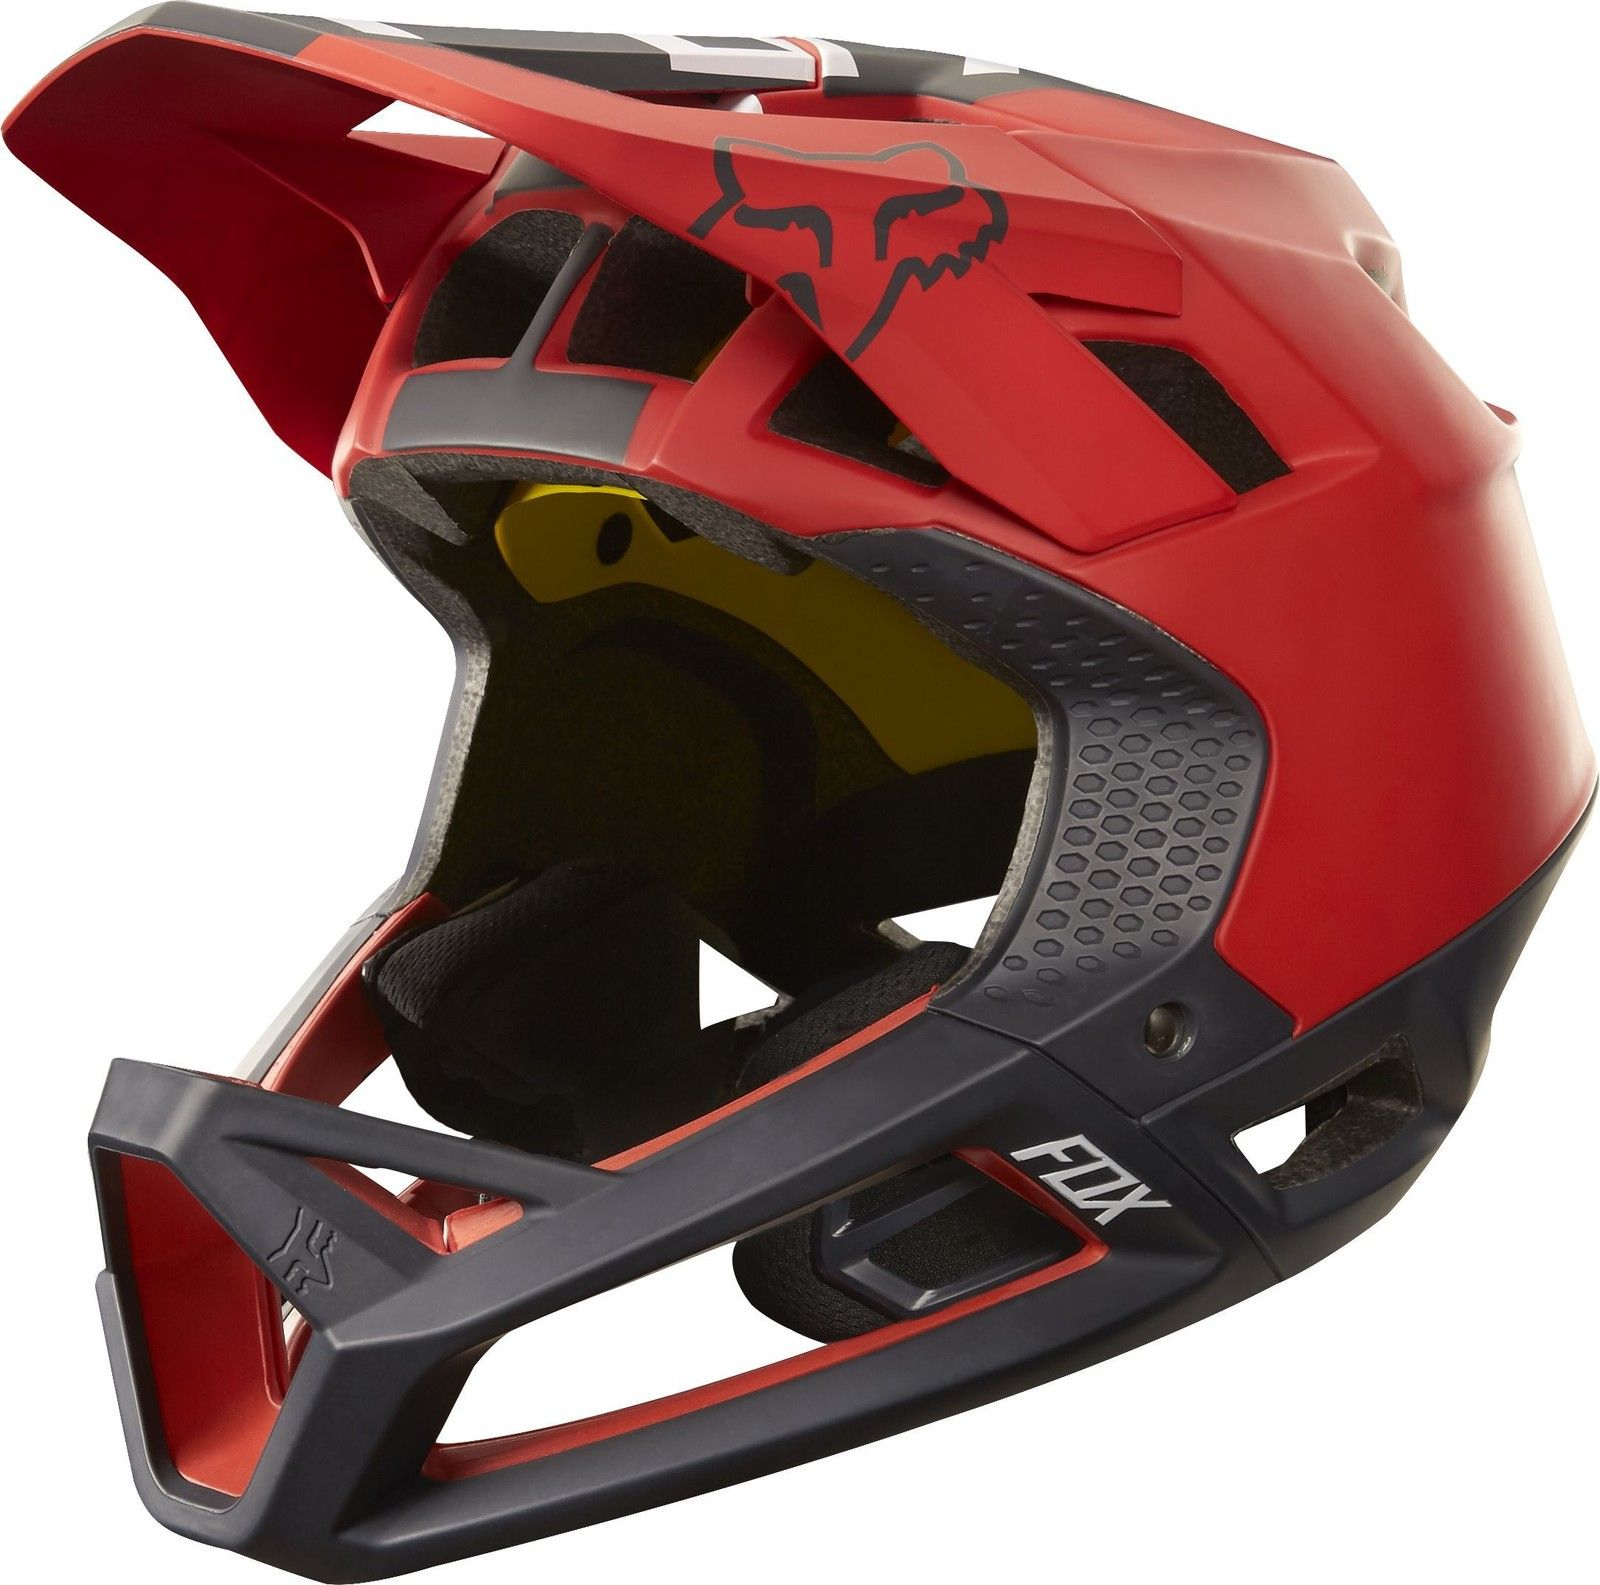 2017 Fox Racing Proframe 1600 1585 Mountain Bike Helmets Mountain Bike Shoes Bike Helmet